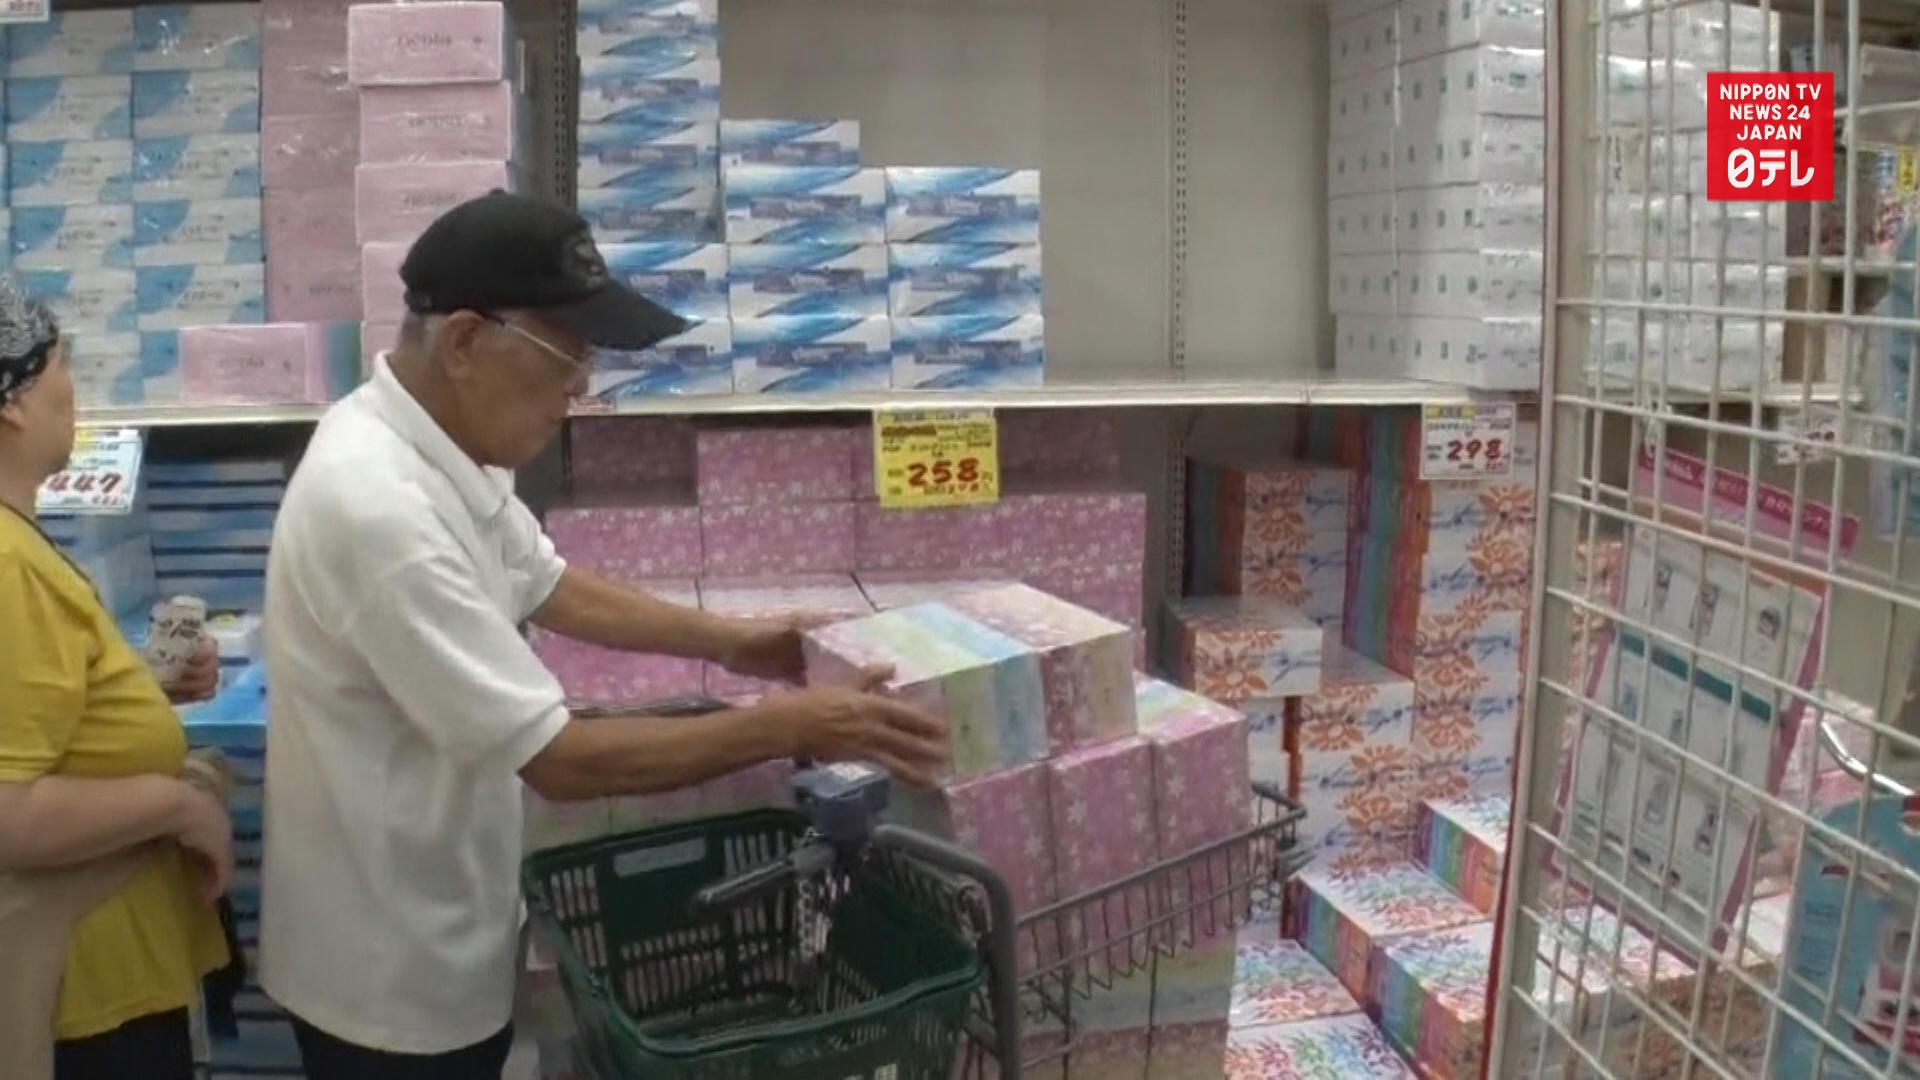 Japan braces for consumption tax hike